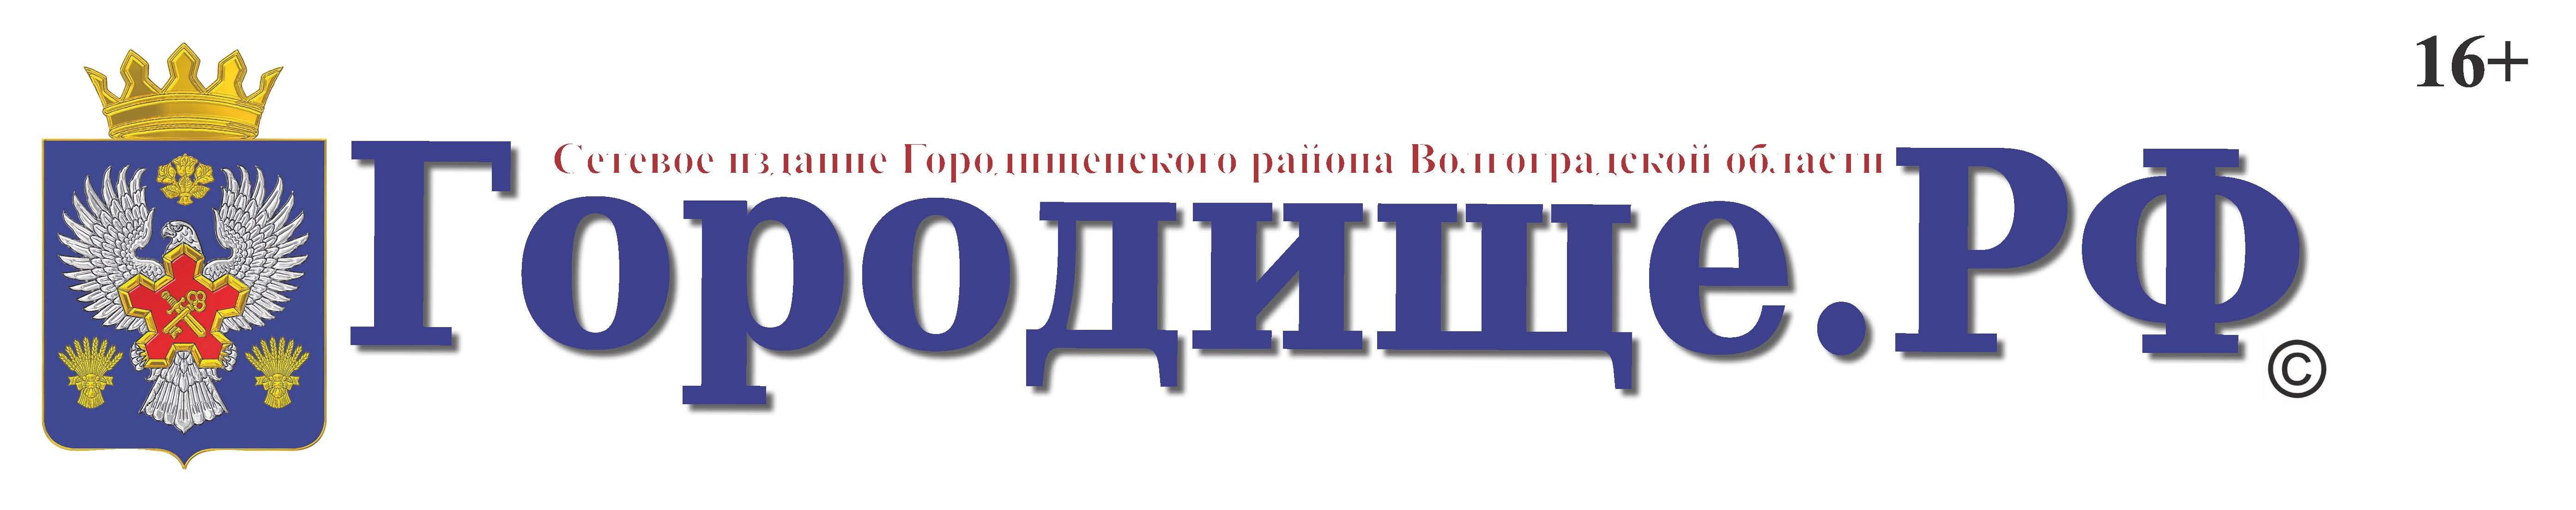 "Газета ""Междуречье"""